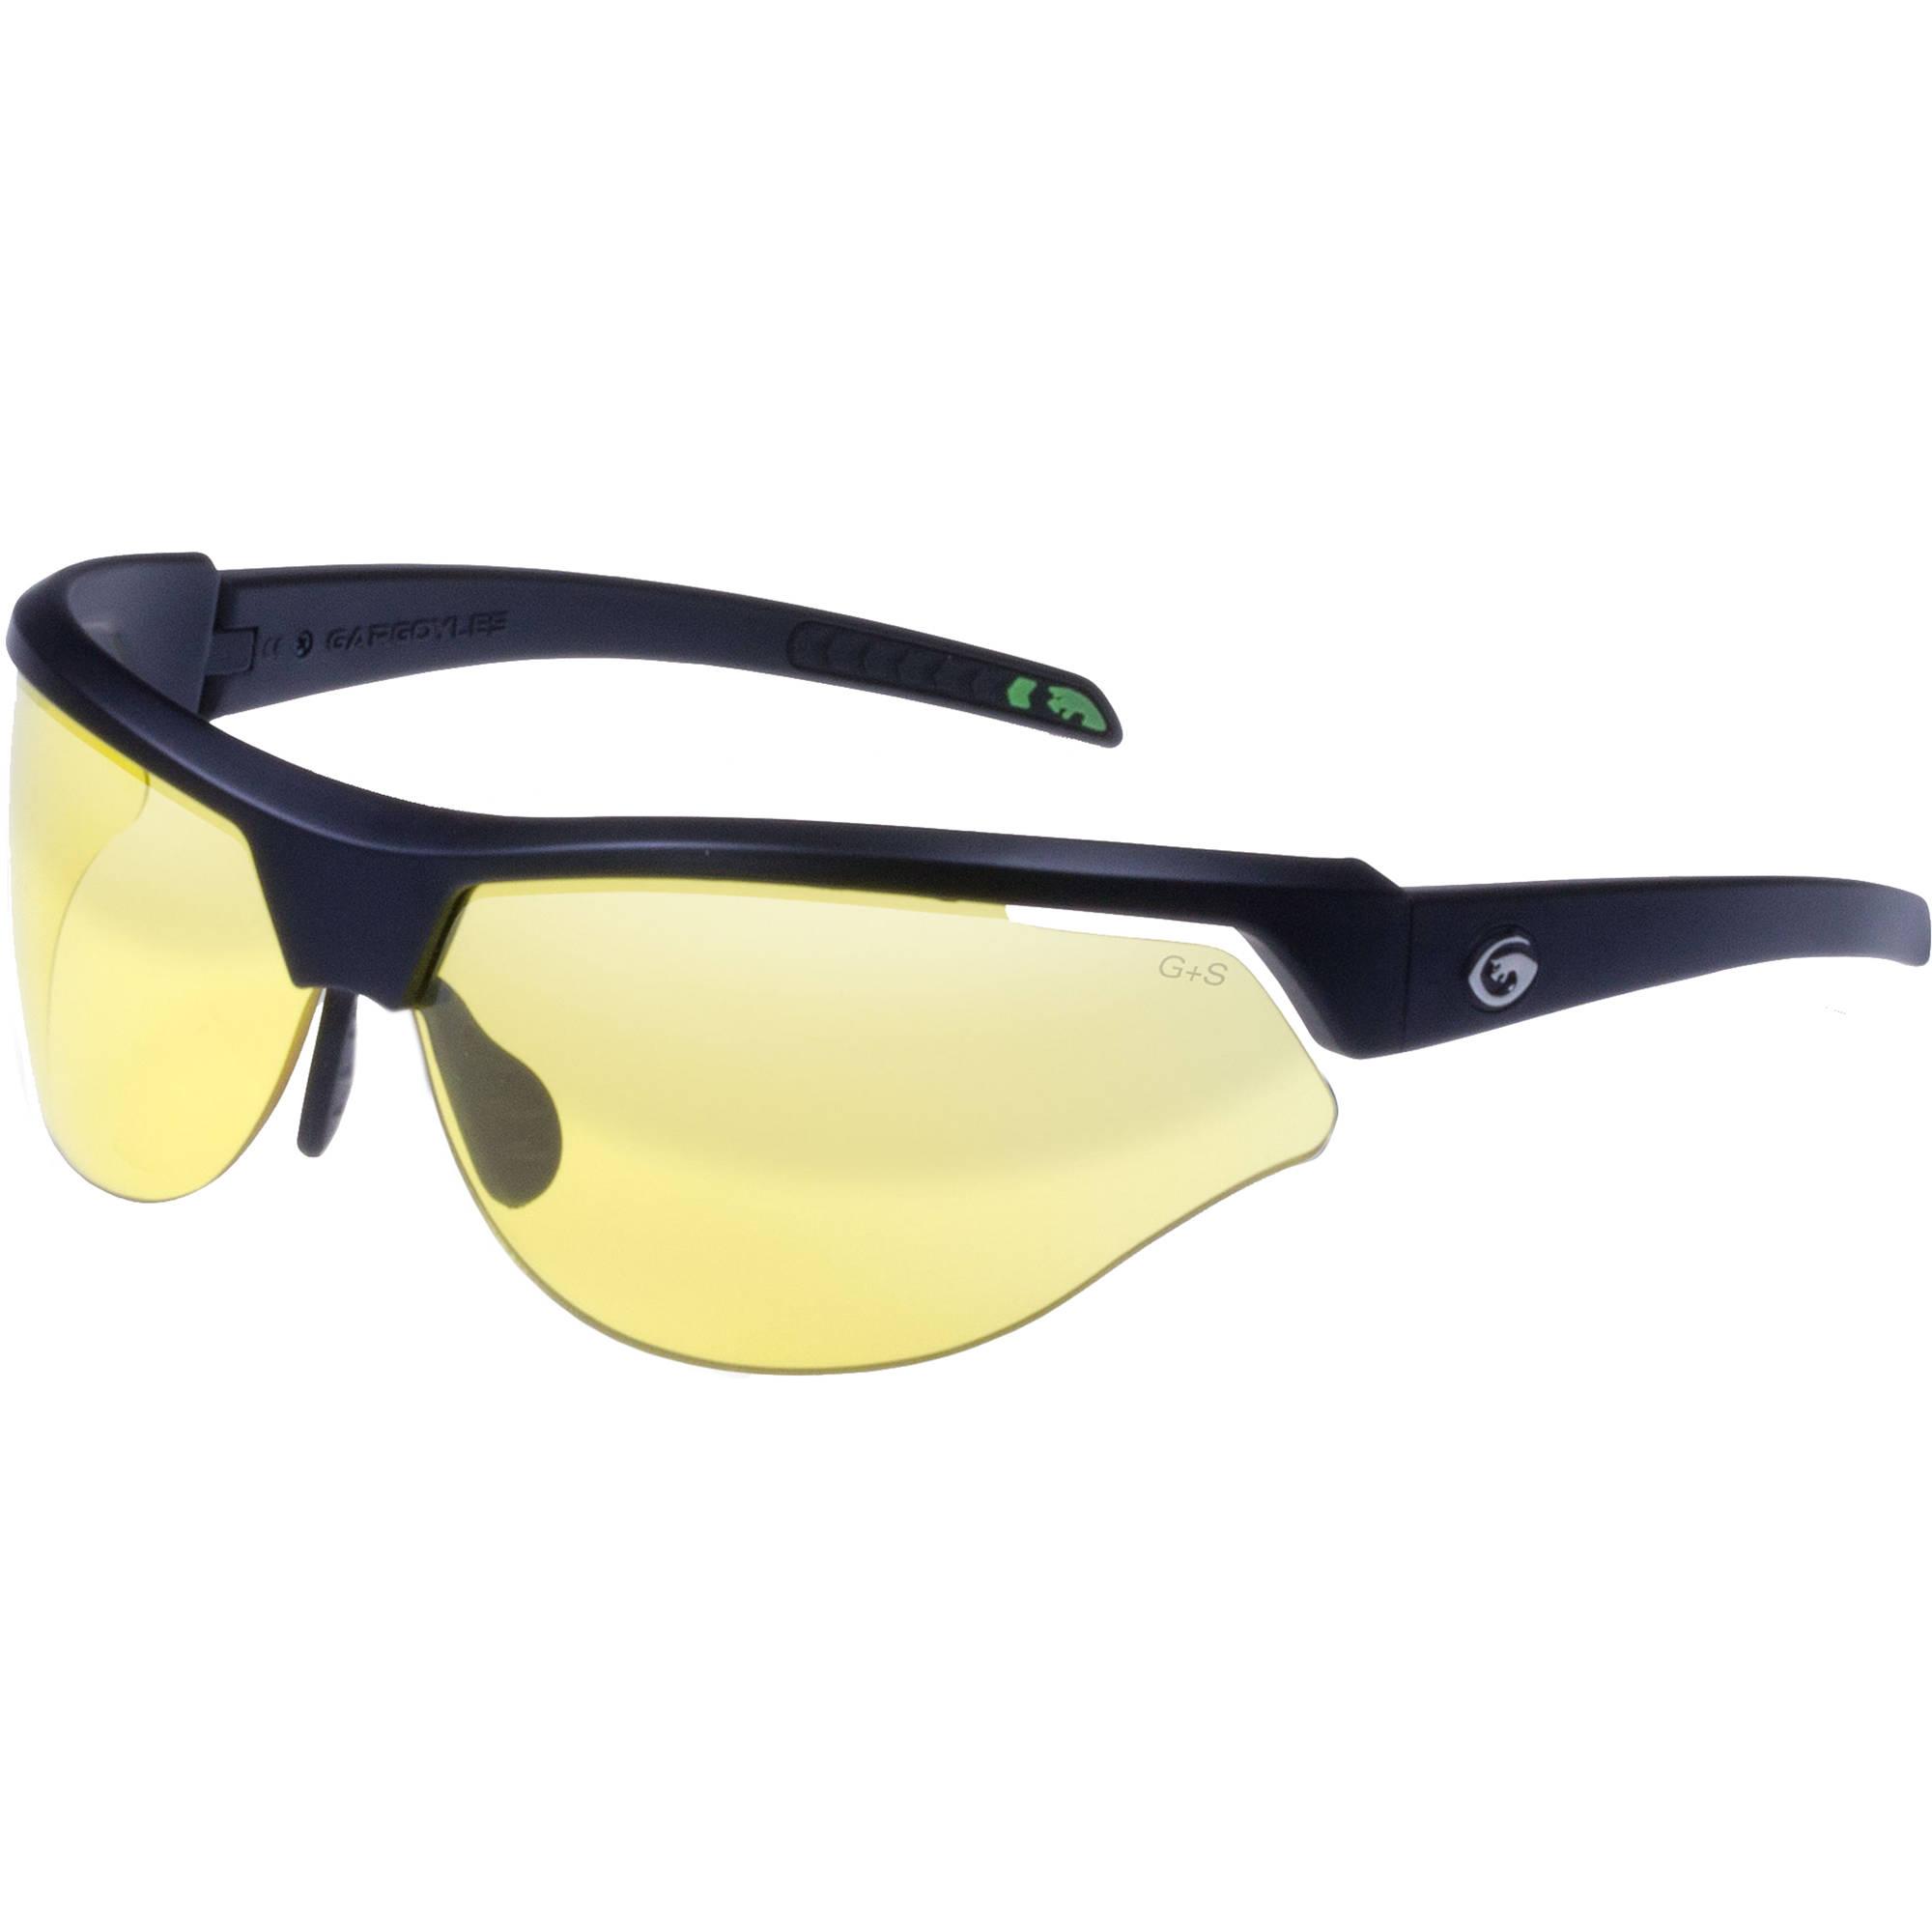 Gargoyles Cardinal-PR Sunglasses 10700063.QTM B&H Photo Video